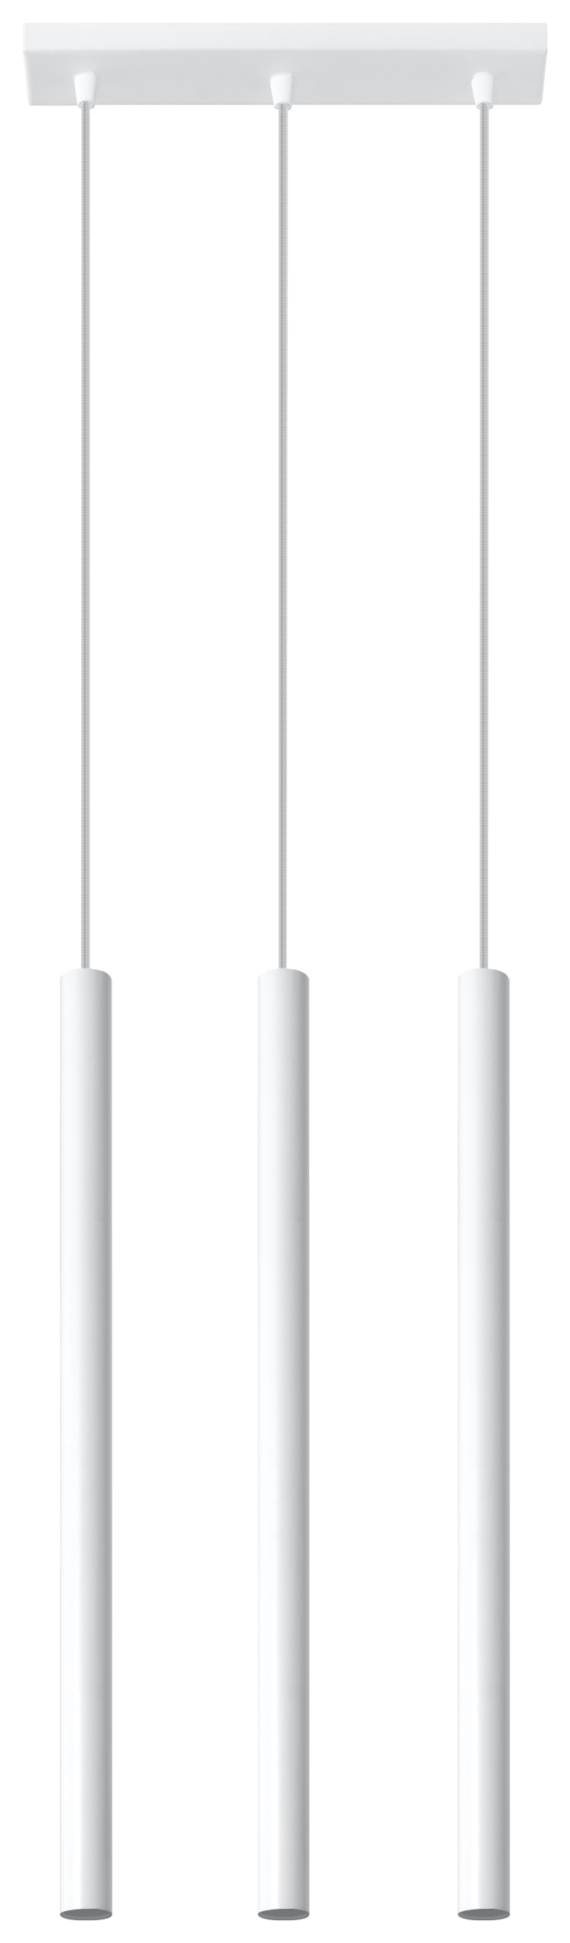 Designerska lampa wisząca Pastelo 3 punktowa 03 biała 01